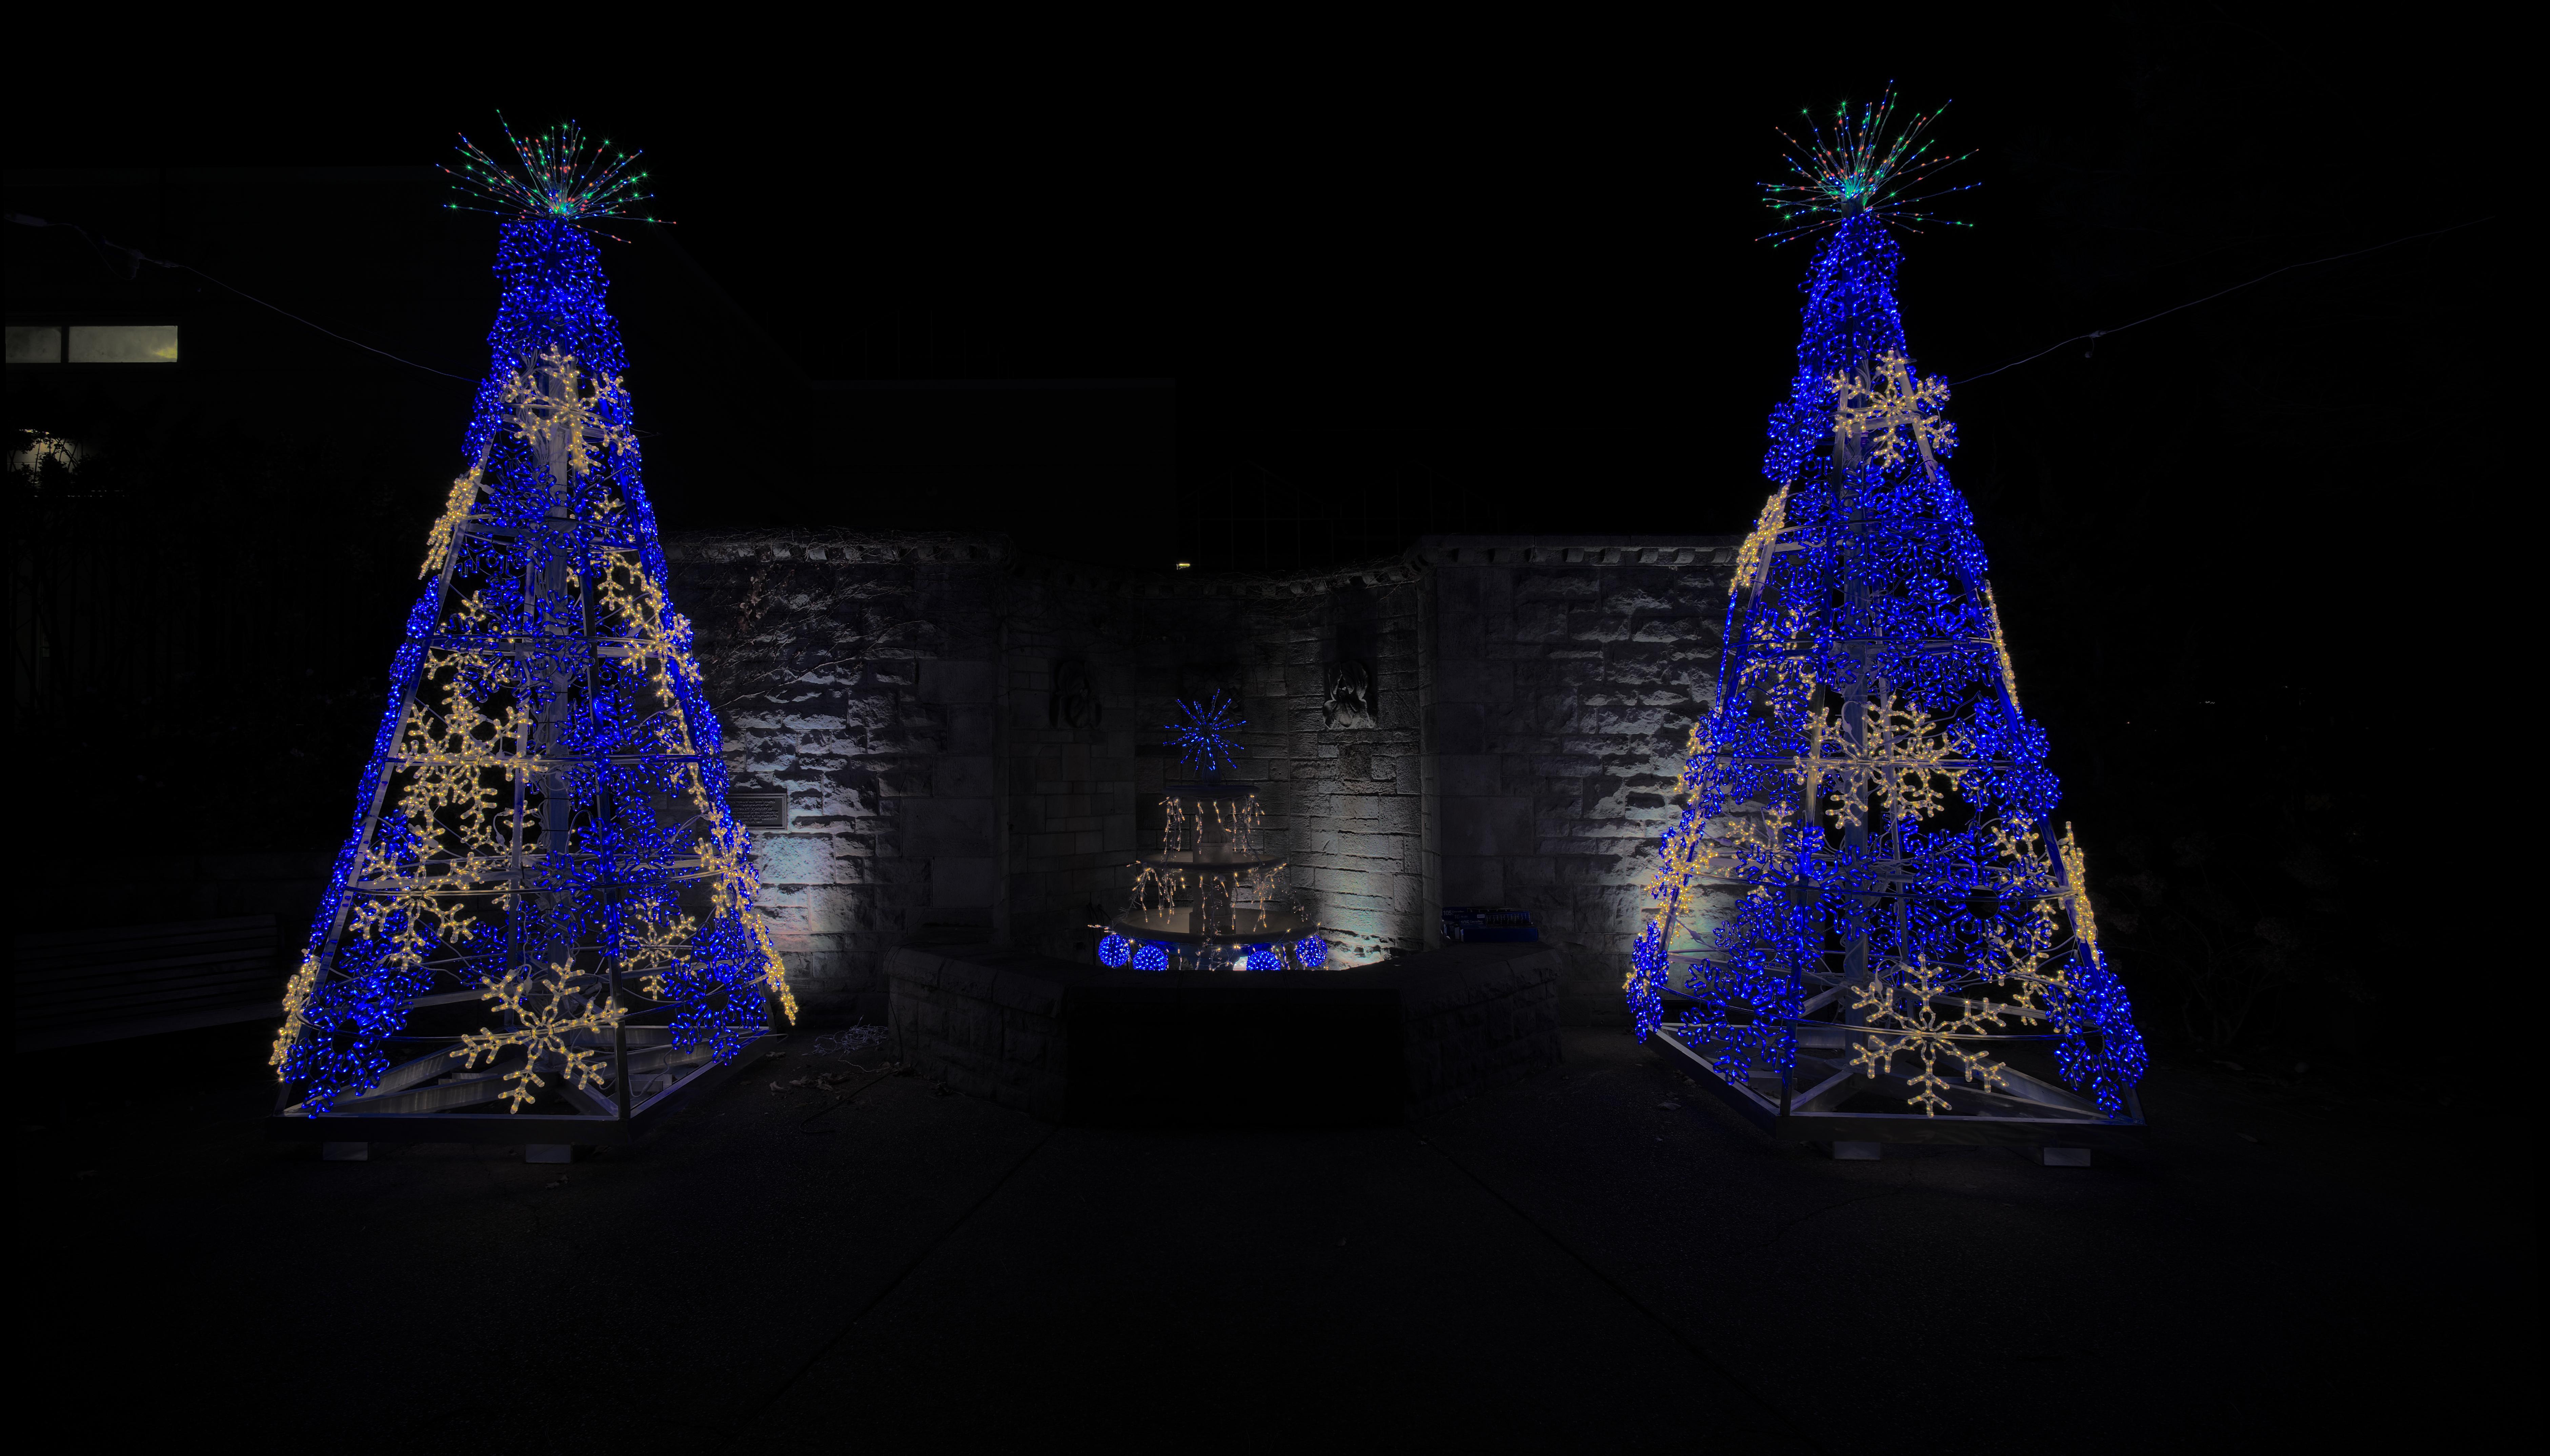 filephipps conservatory winter 2015 christmas treesjpg